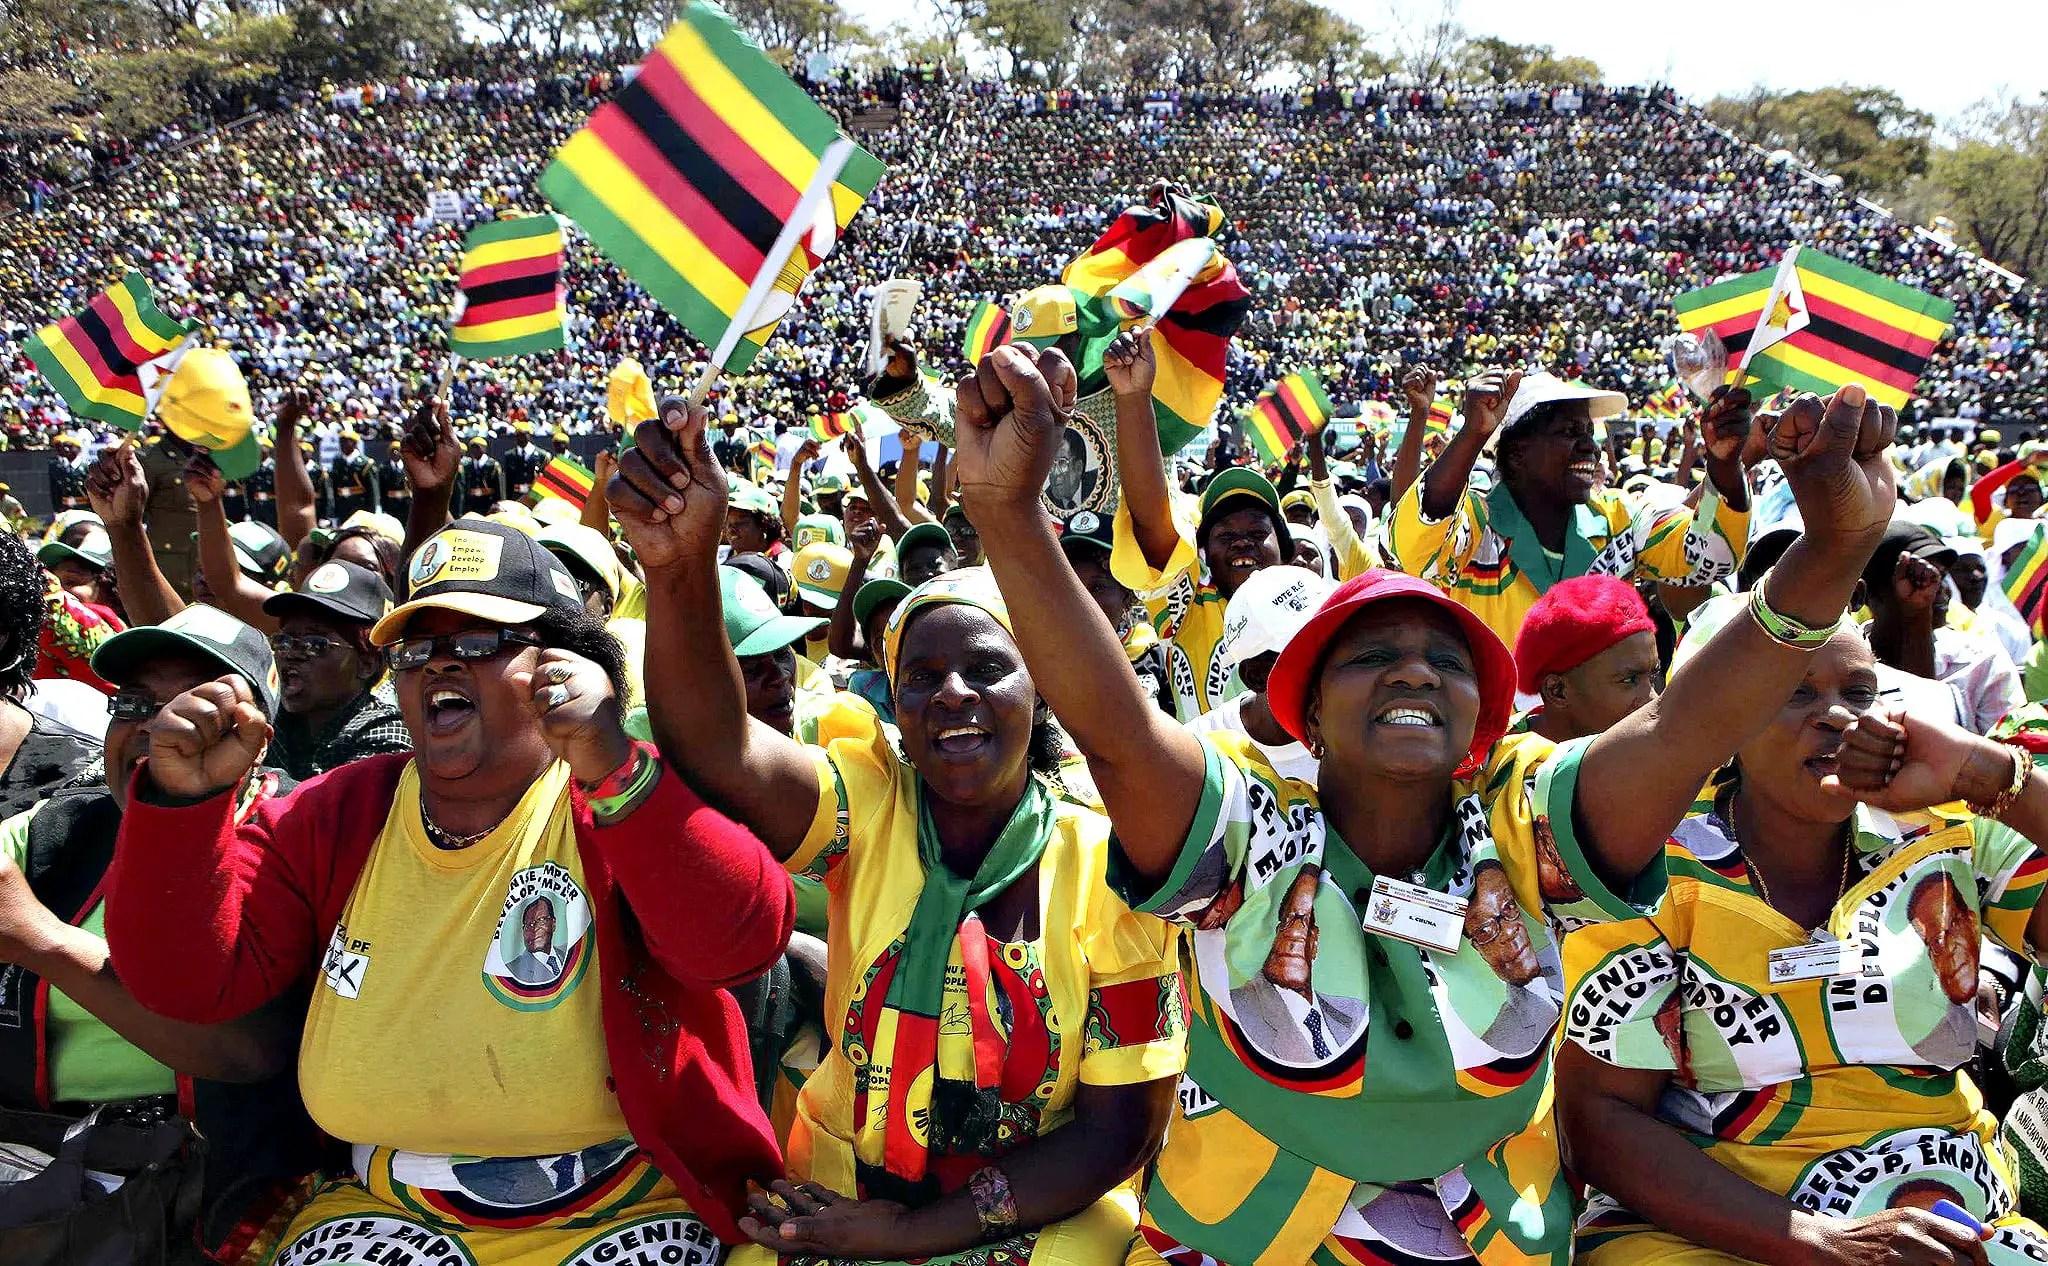 Zimbabwe: Crowds gather to see Emmerson Mnangagwa sworn in